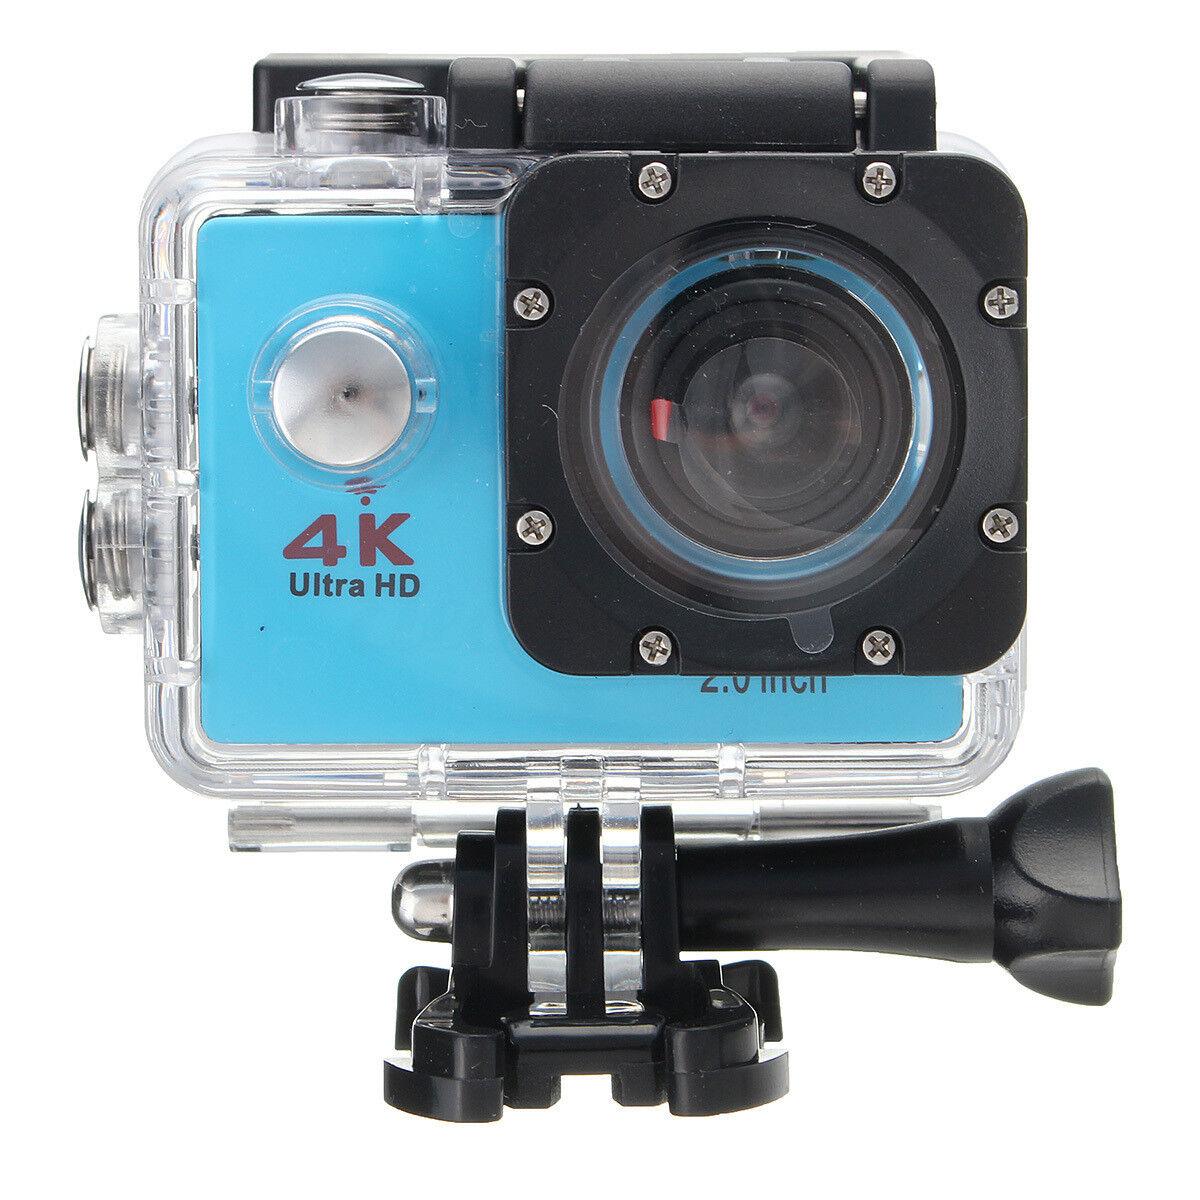 SJ9000 HD 1080P Wifi Waterproof Ultra Sport Action Camera Camcorder 4K DVR Cam